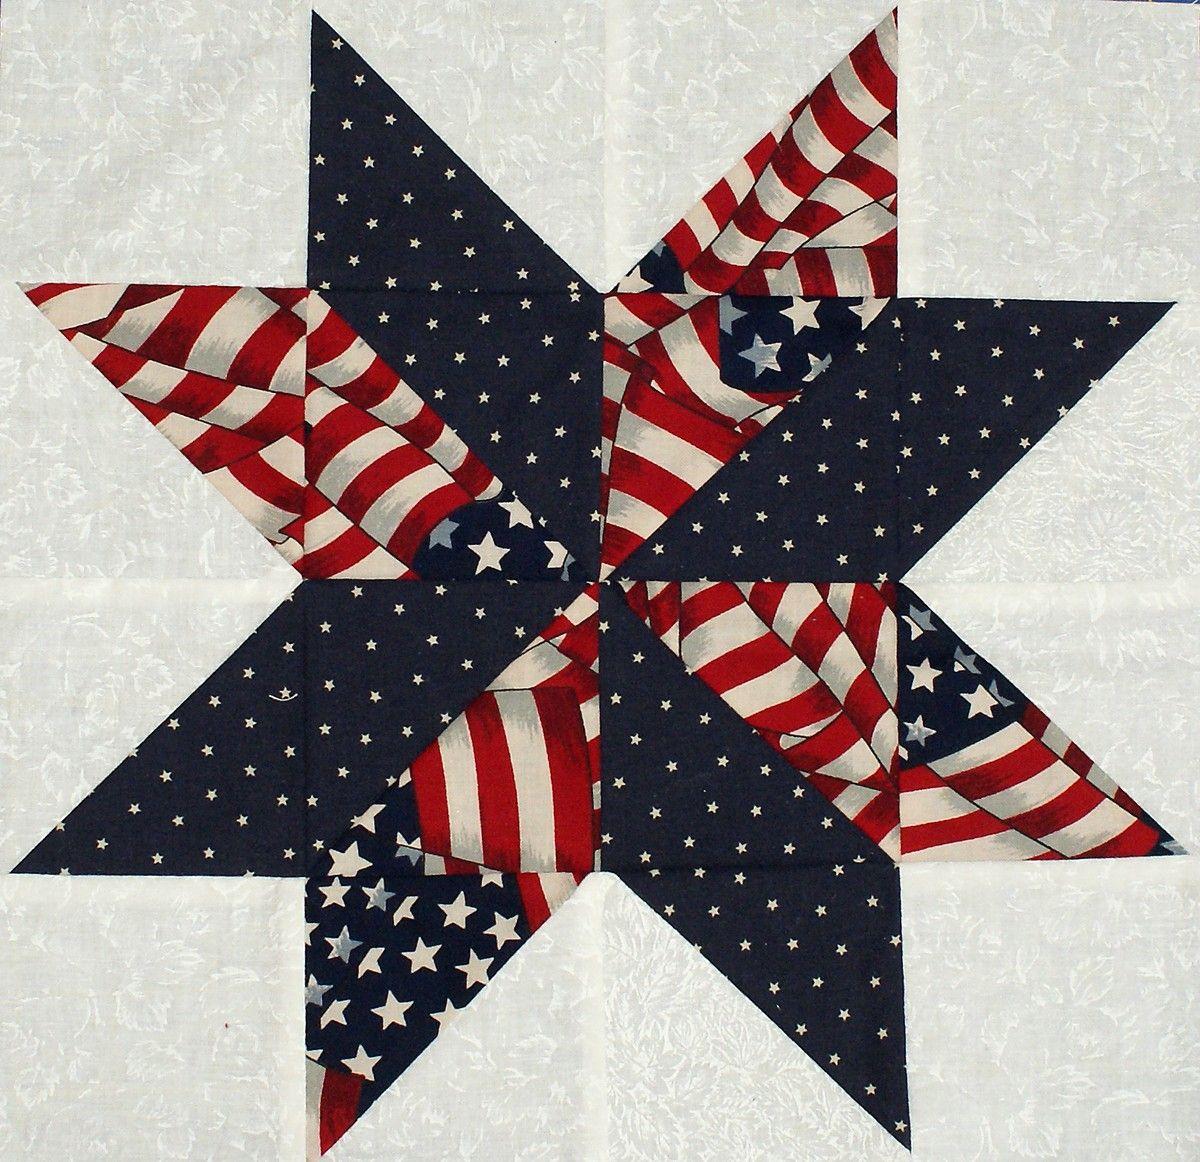 Starflower Quilt Blocks - Patriotic Flag and Star Prints | Star ... : star flower quilt block pattern - Adamdwight.com